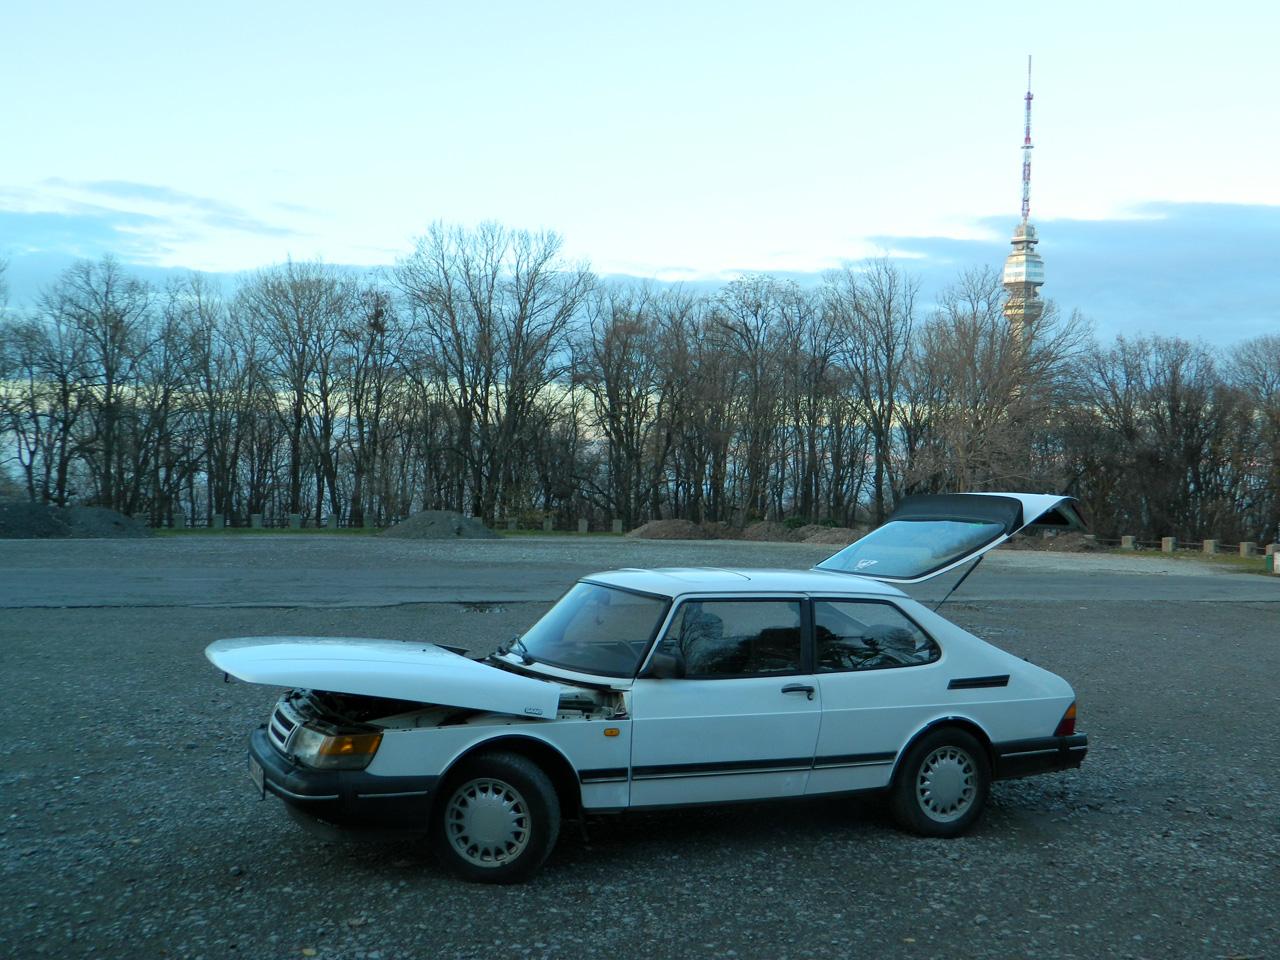 The Best Car Ever – An Intrepid Traveler's Blog